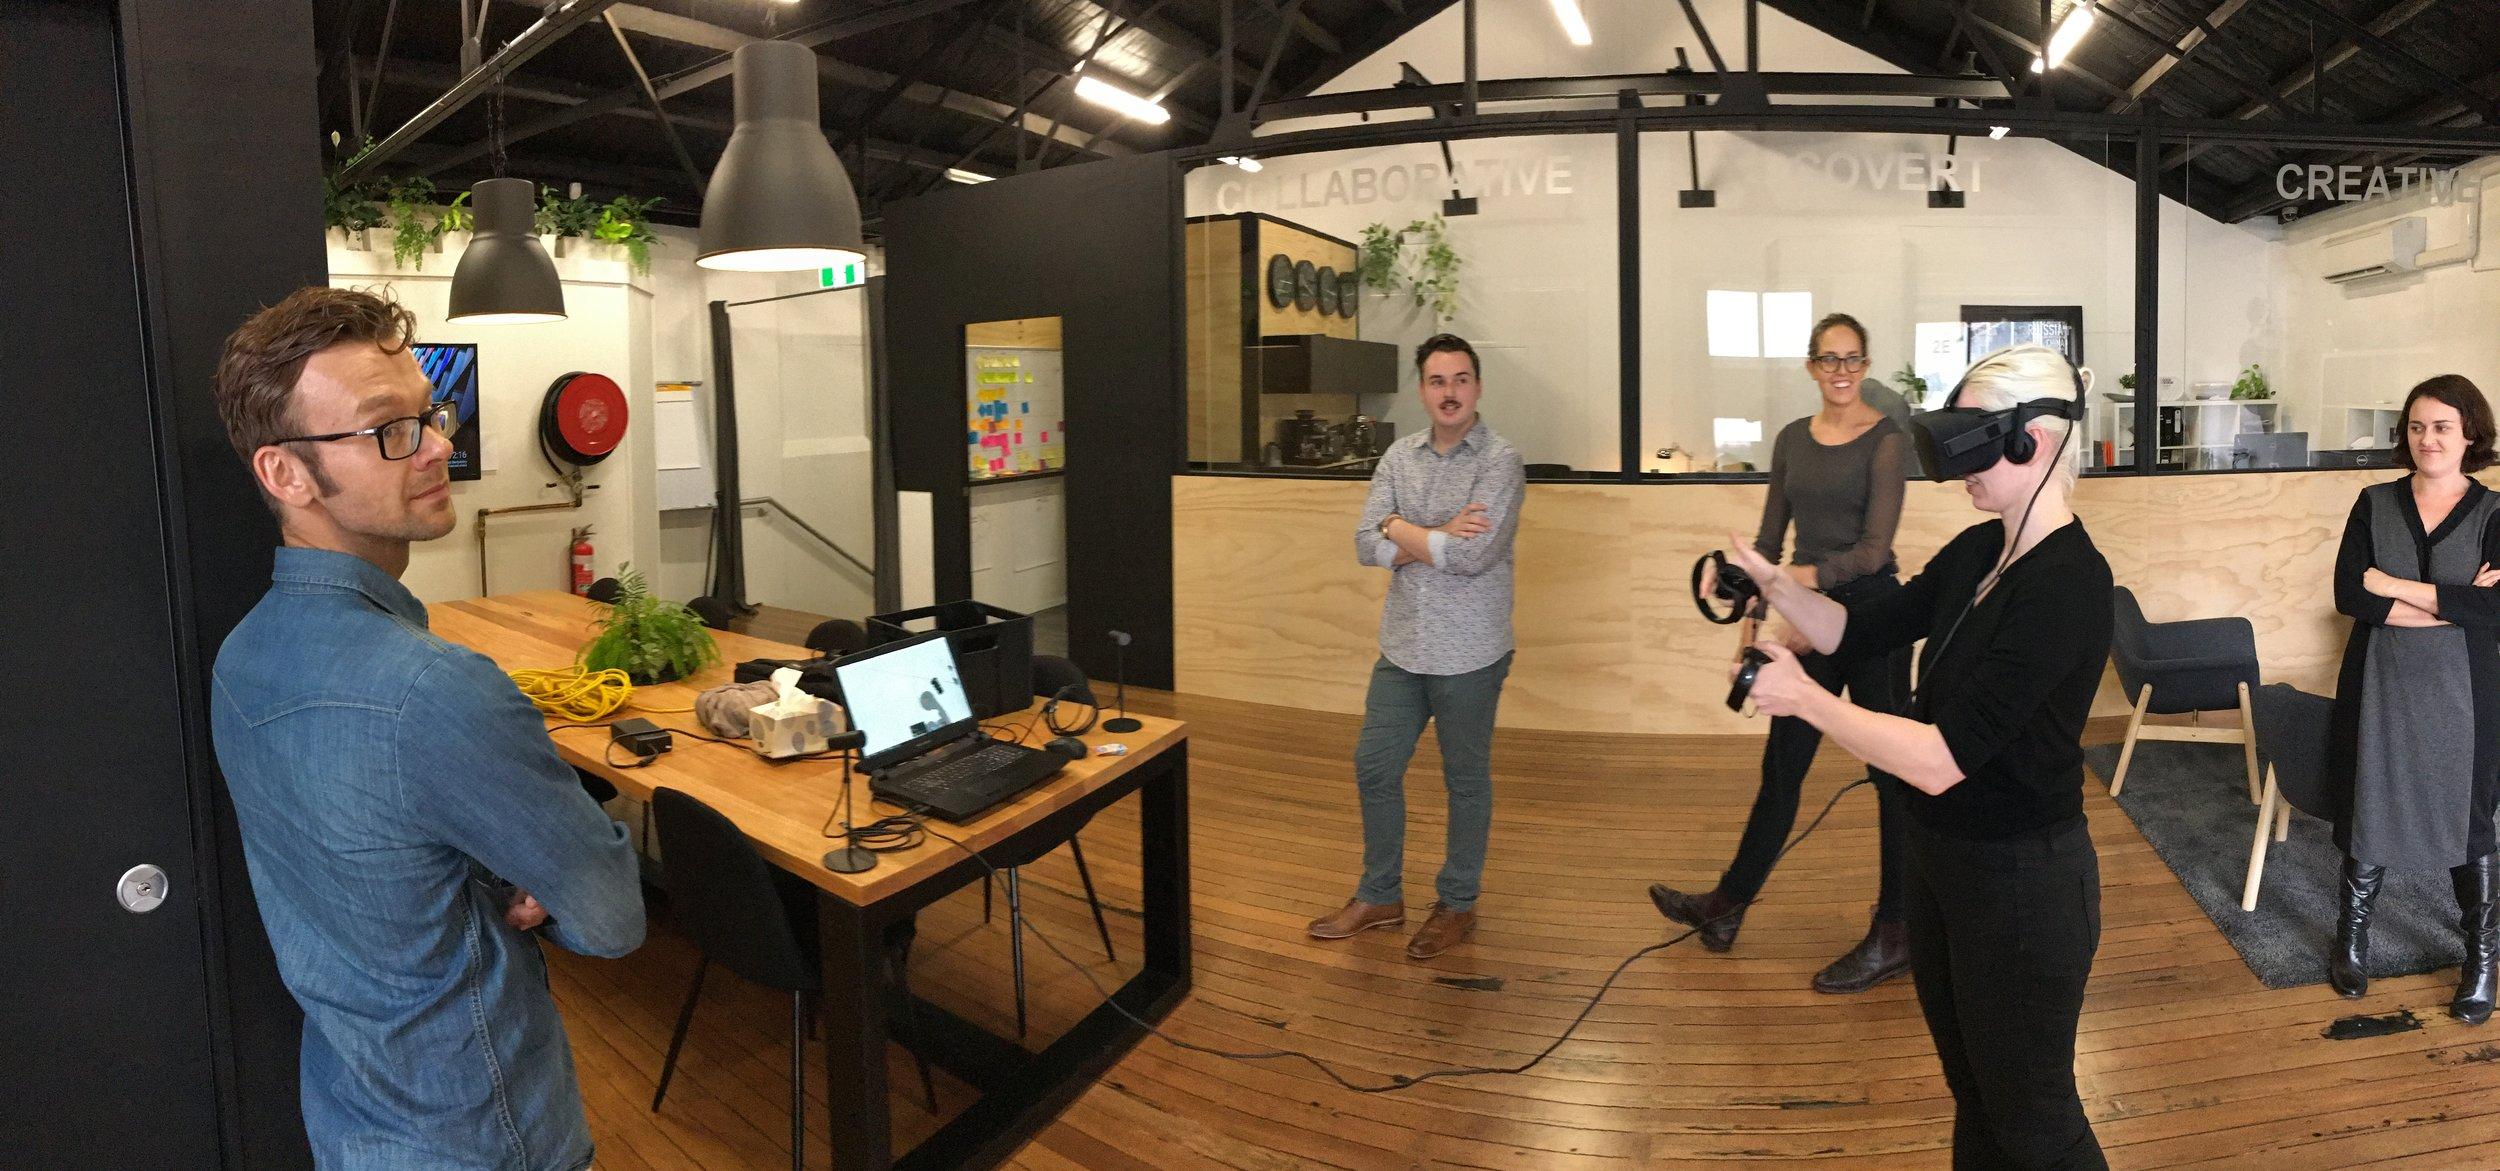 Studio Demo Day - VR Experiences - L to R: Jason Smith, Angus Shaw, Alex French, Sara Pontoppidan and Felicity Davidson